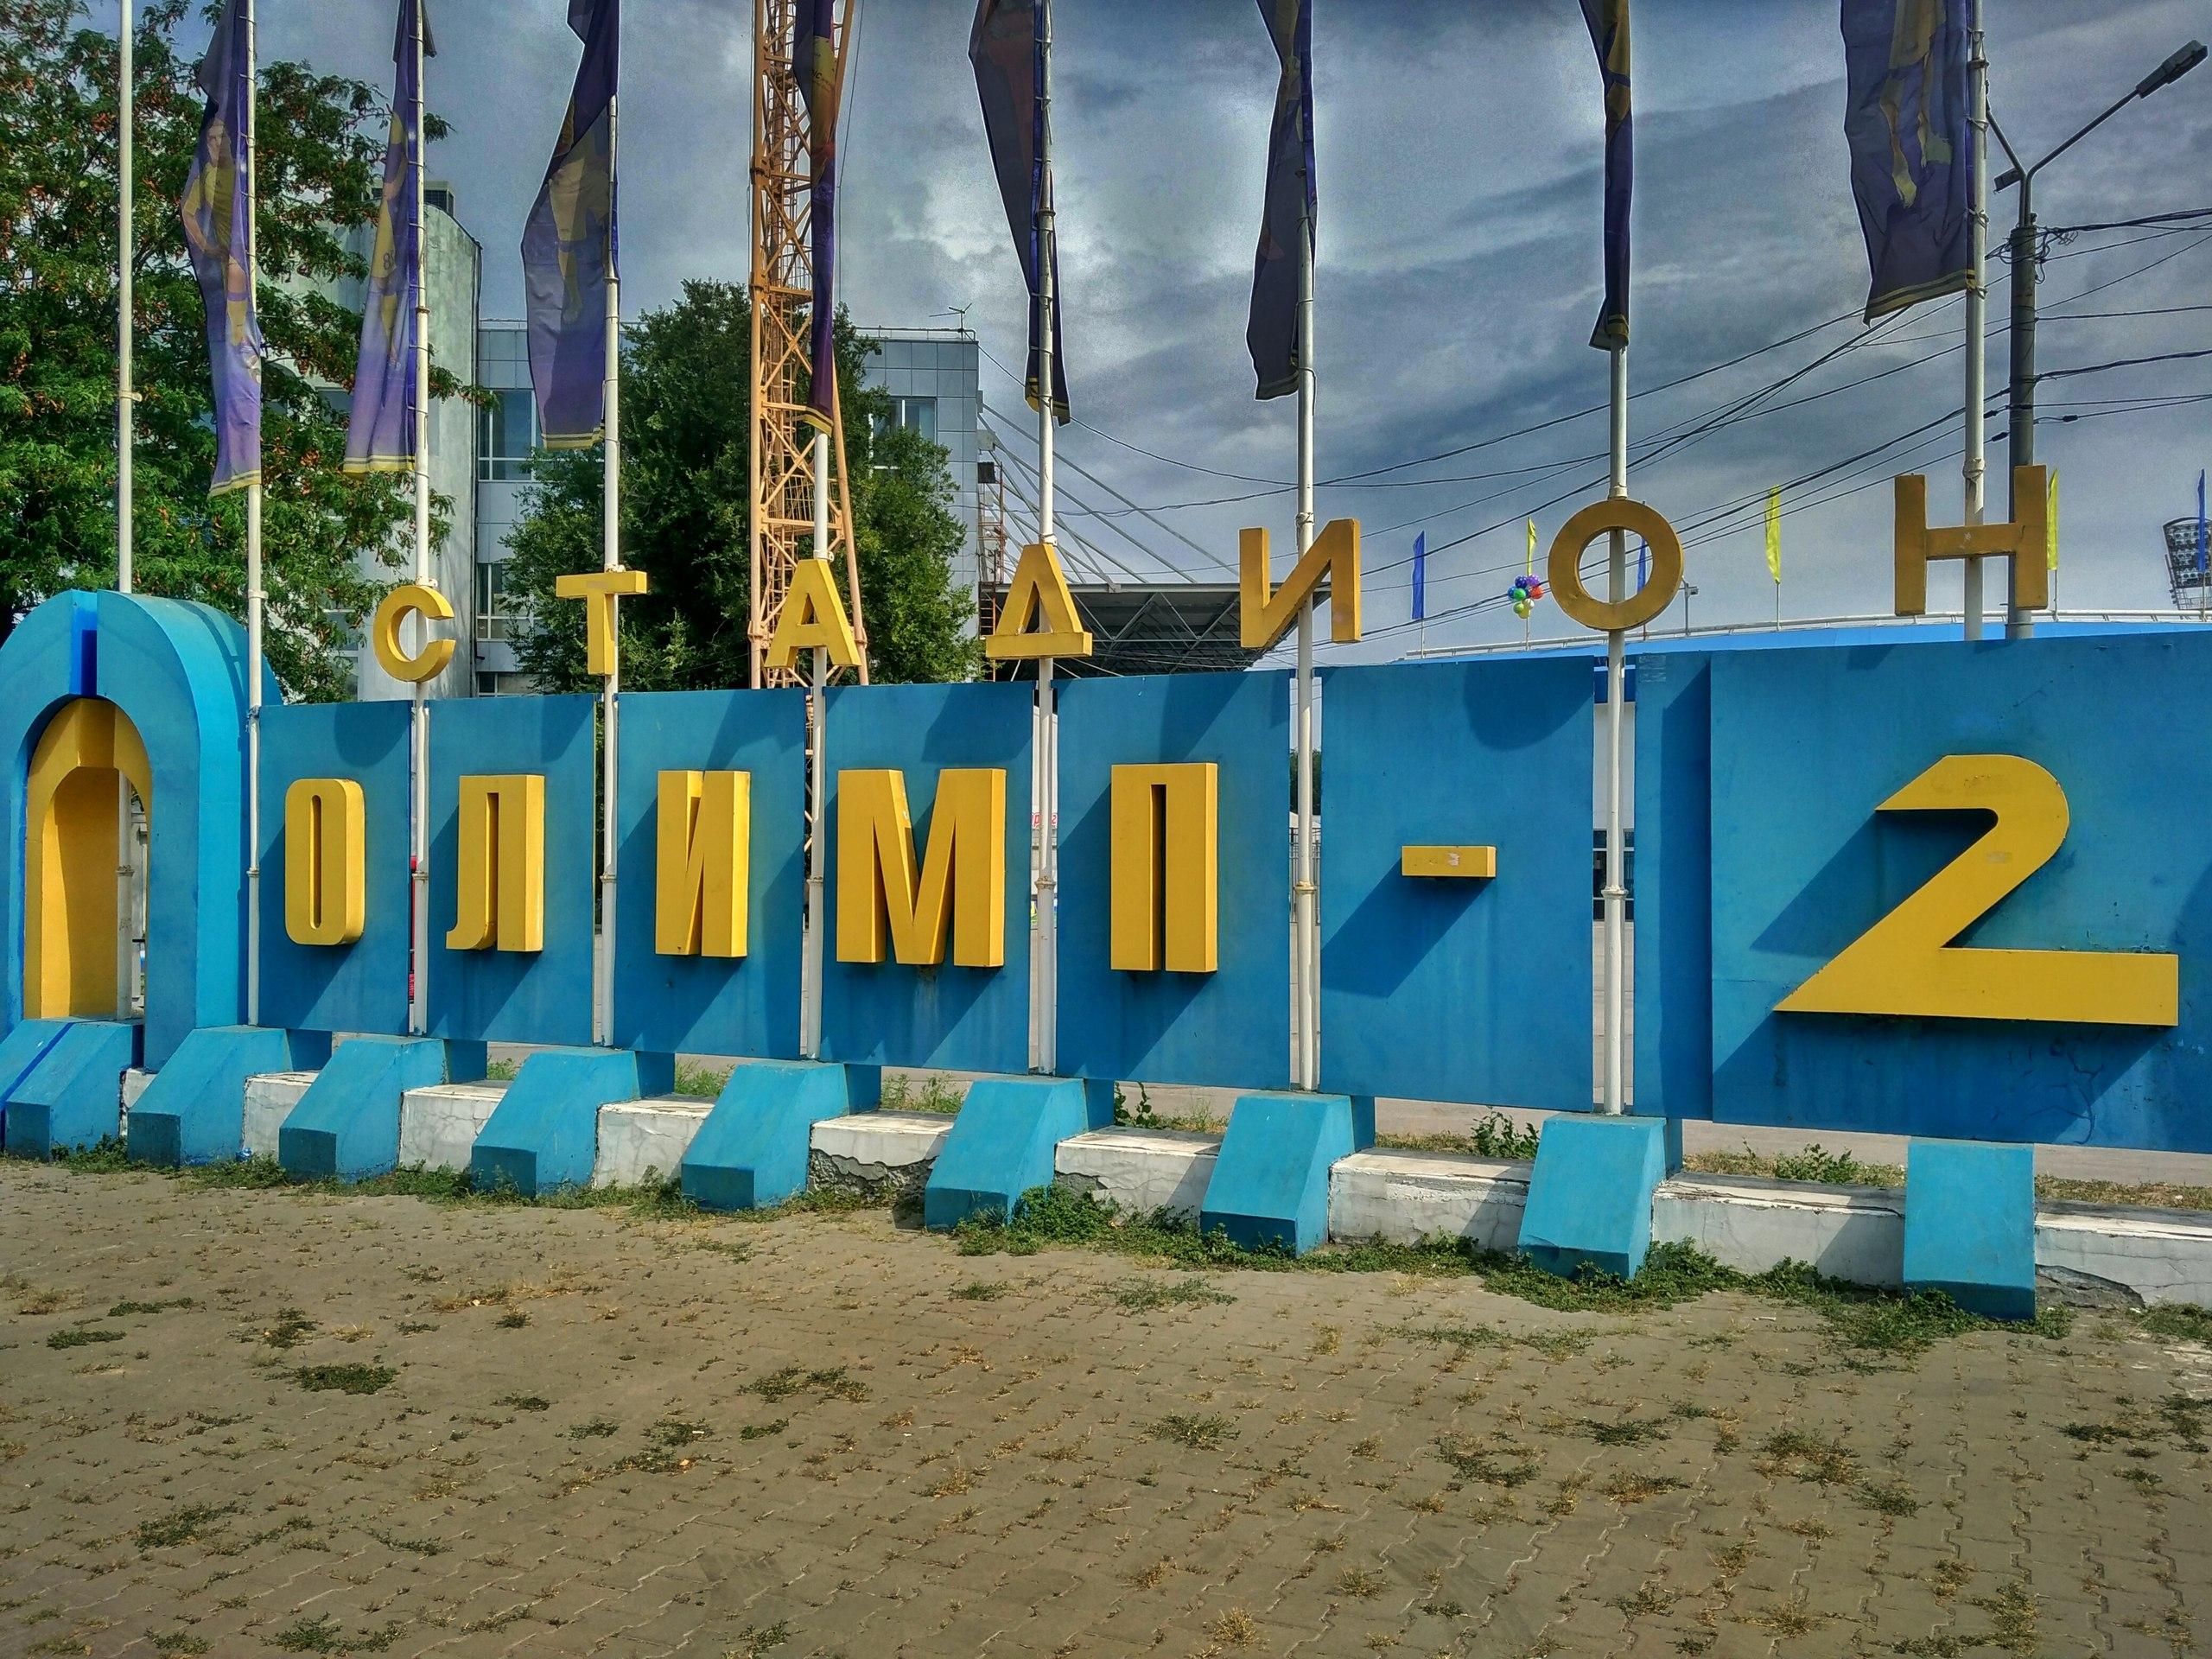 Иван Саввиди профинансирует переименование стадиона «Олимп-2»